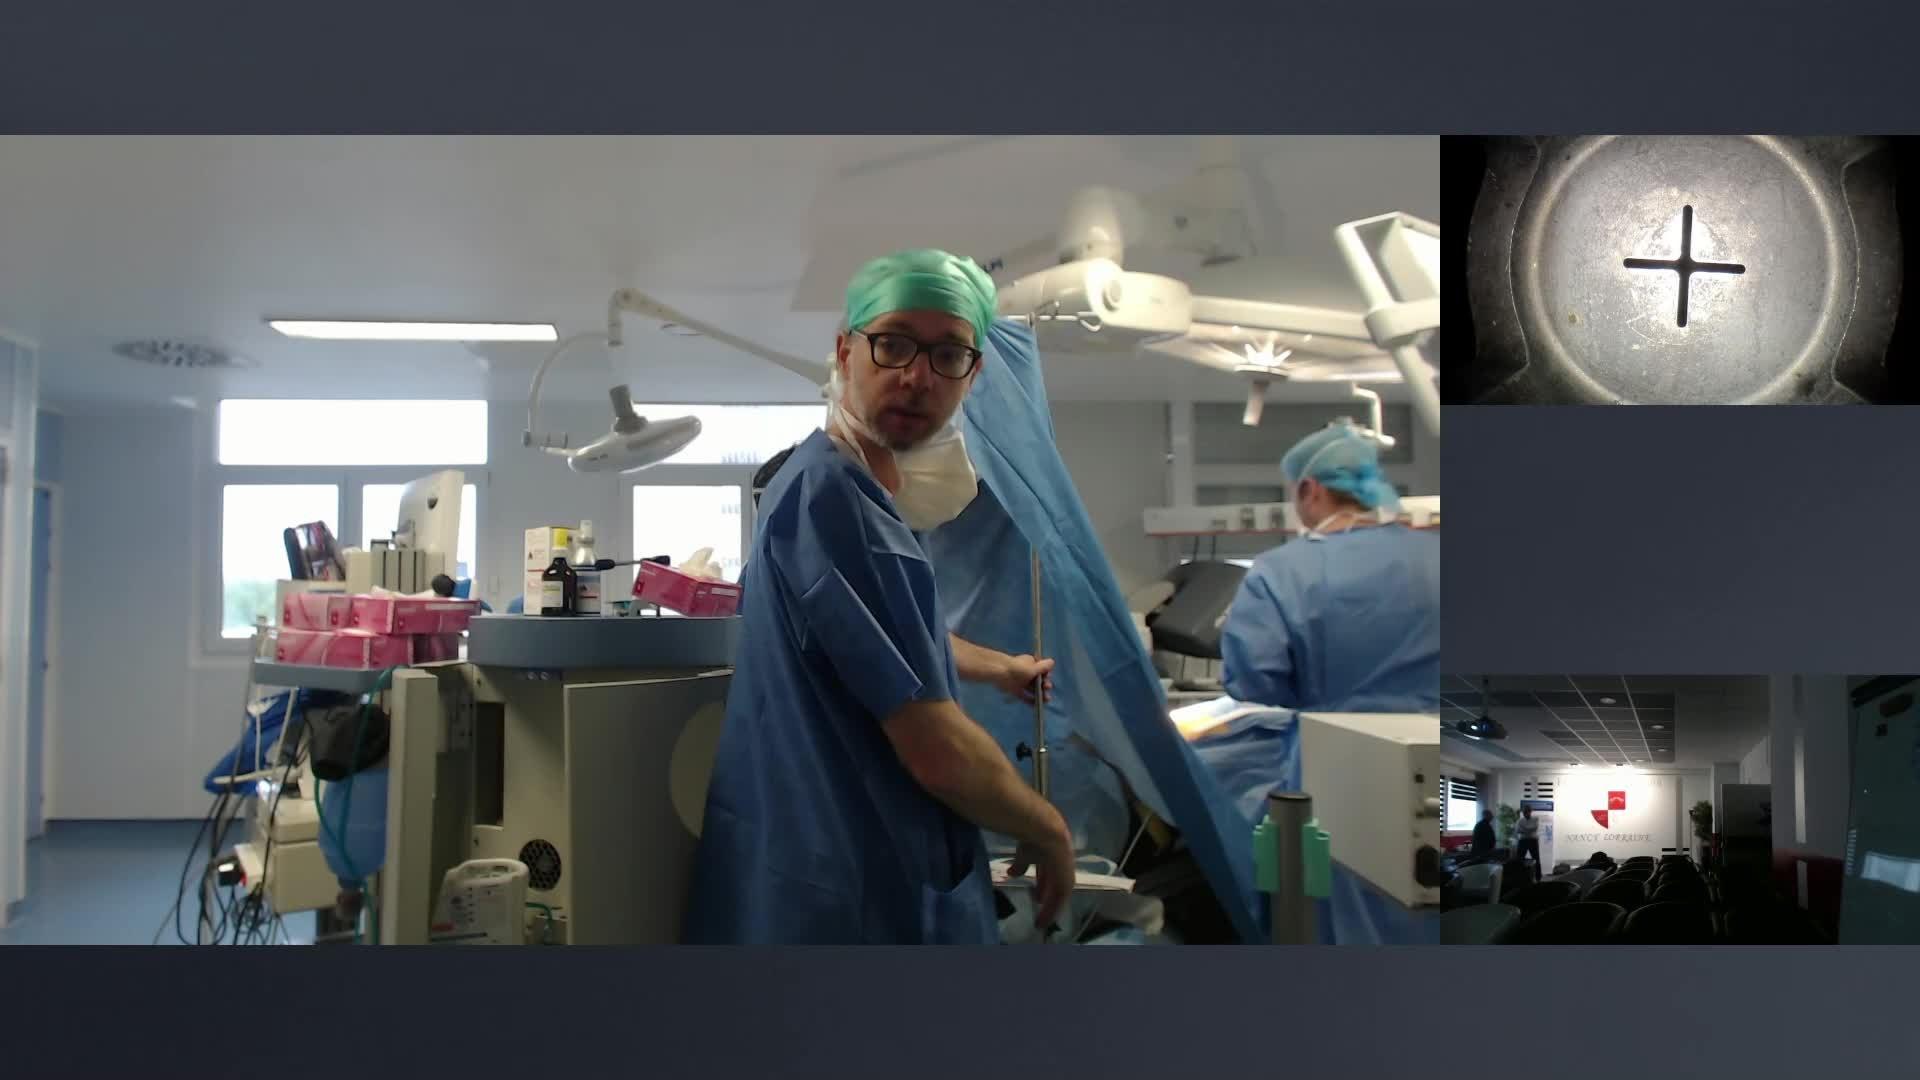 Prostatectomie Robot - CHRU Nancy 2019-04-30 10:05